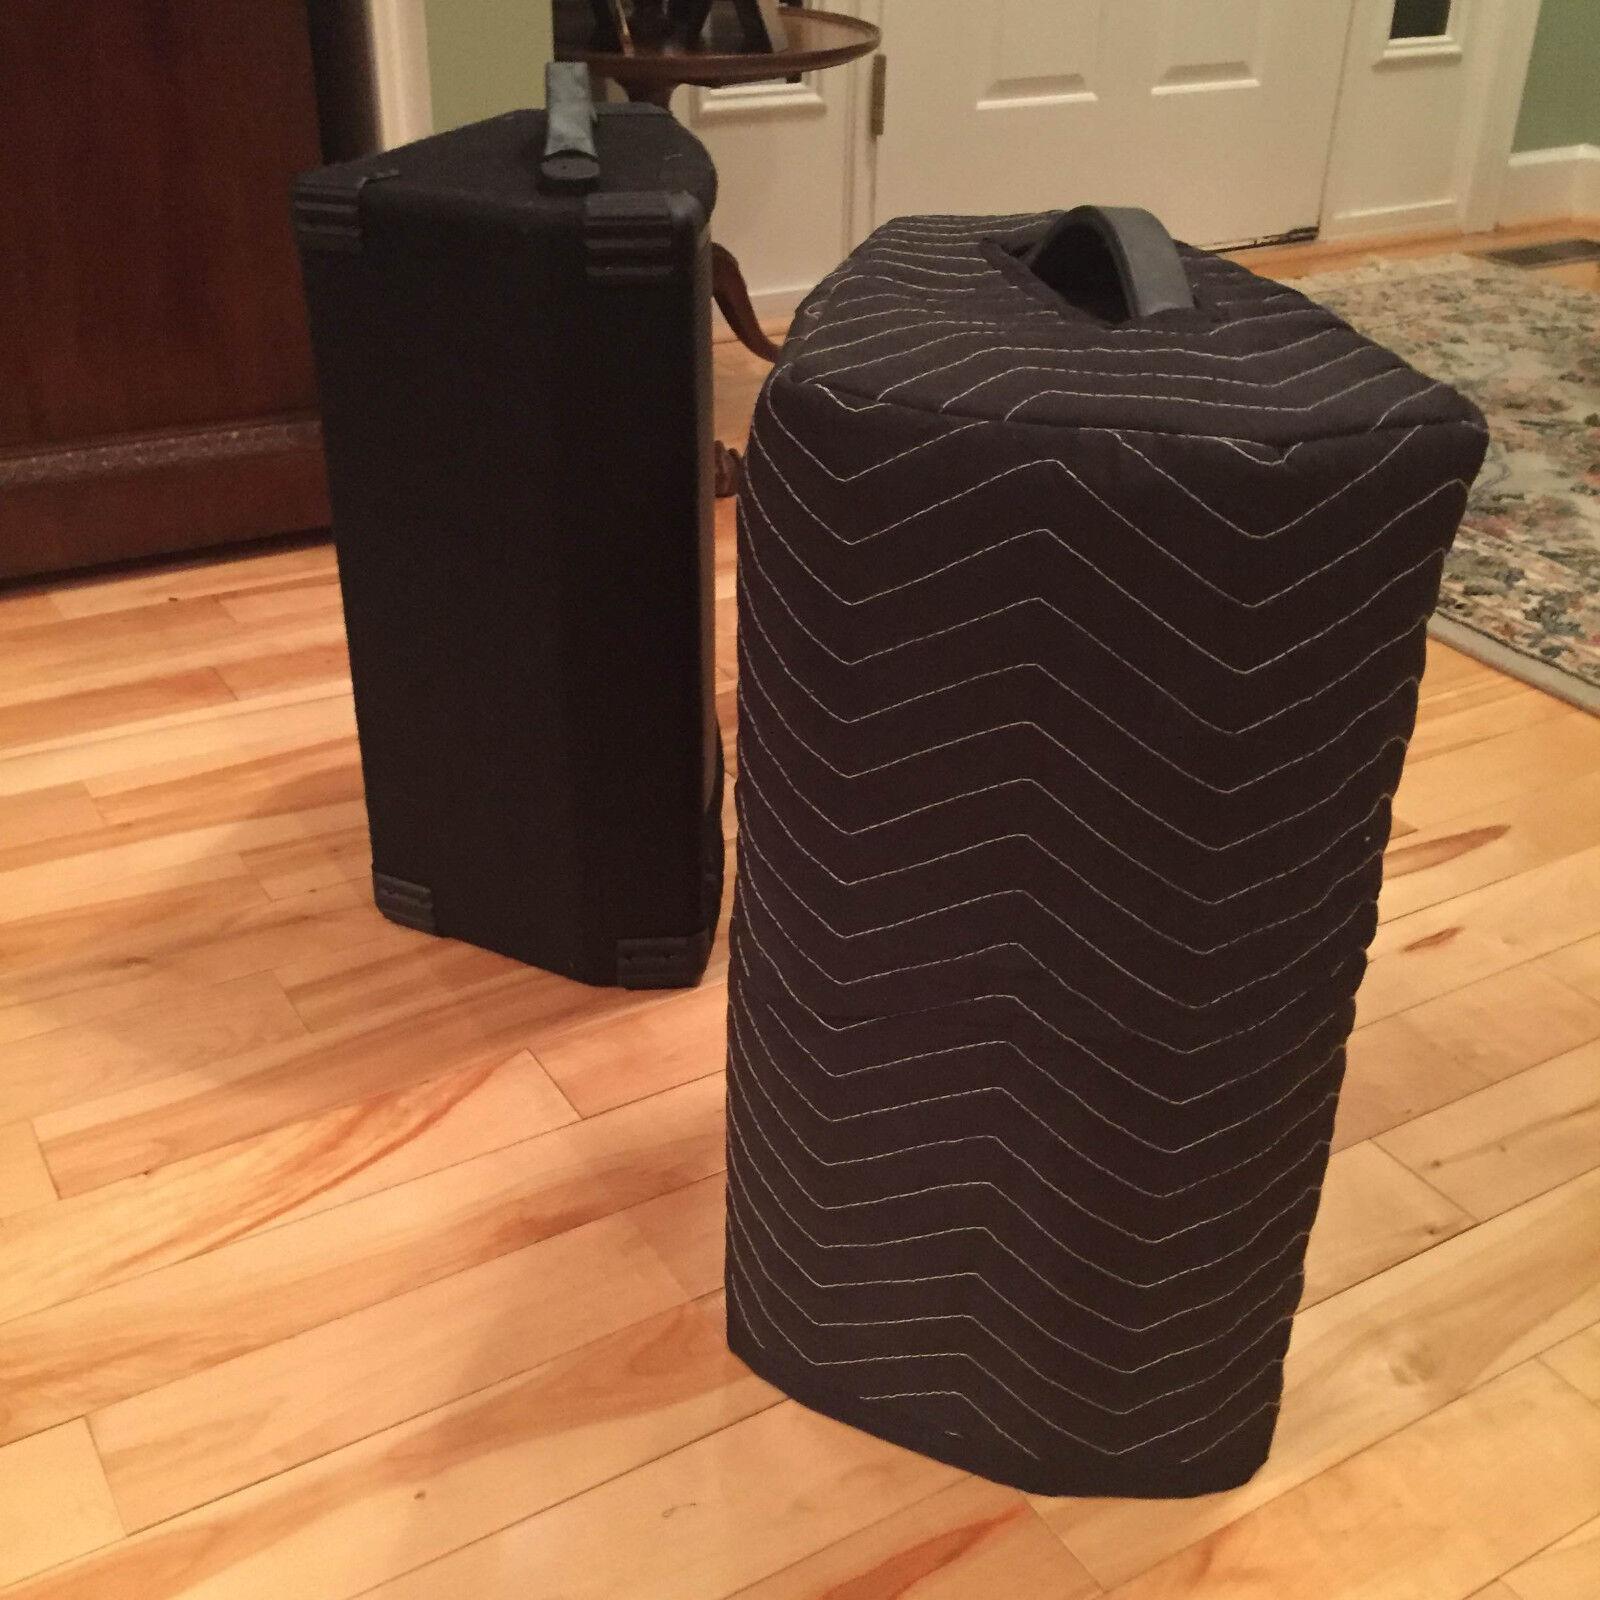 Behringer F1220D Premium Padded schwarz Speaker Covers - (2)  Qty of 1 = 1 Pair